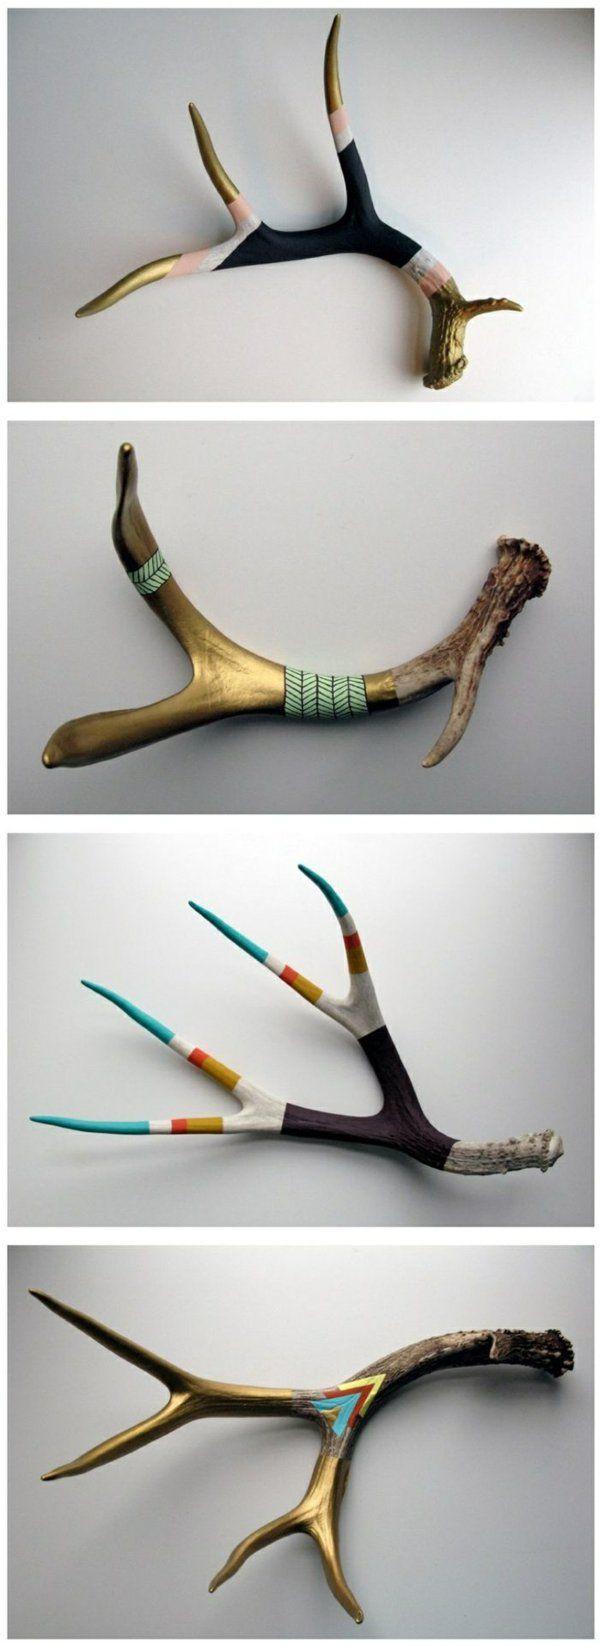 Wanddeko ideen mit treibholz basteln pinterest for Pinterest wanddeko